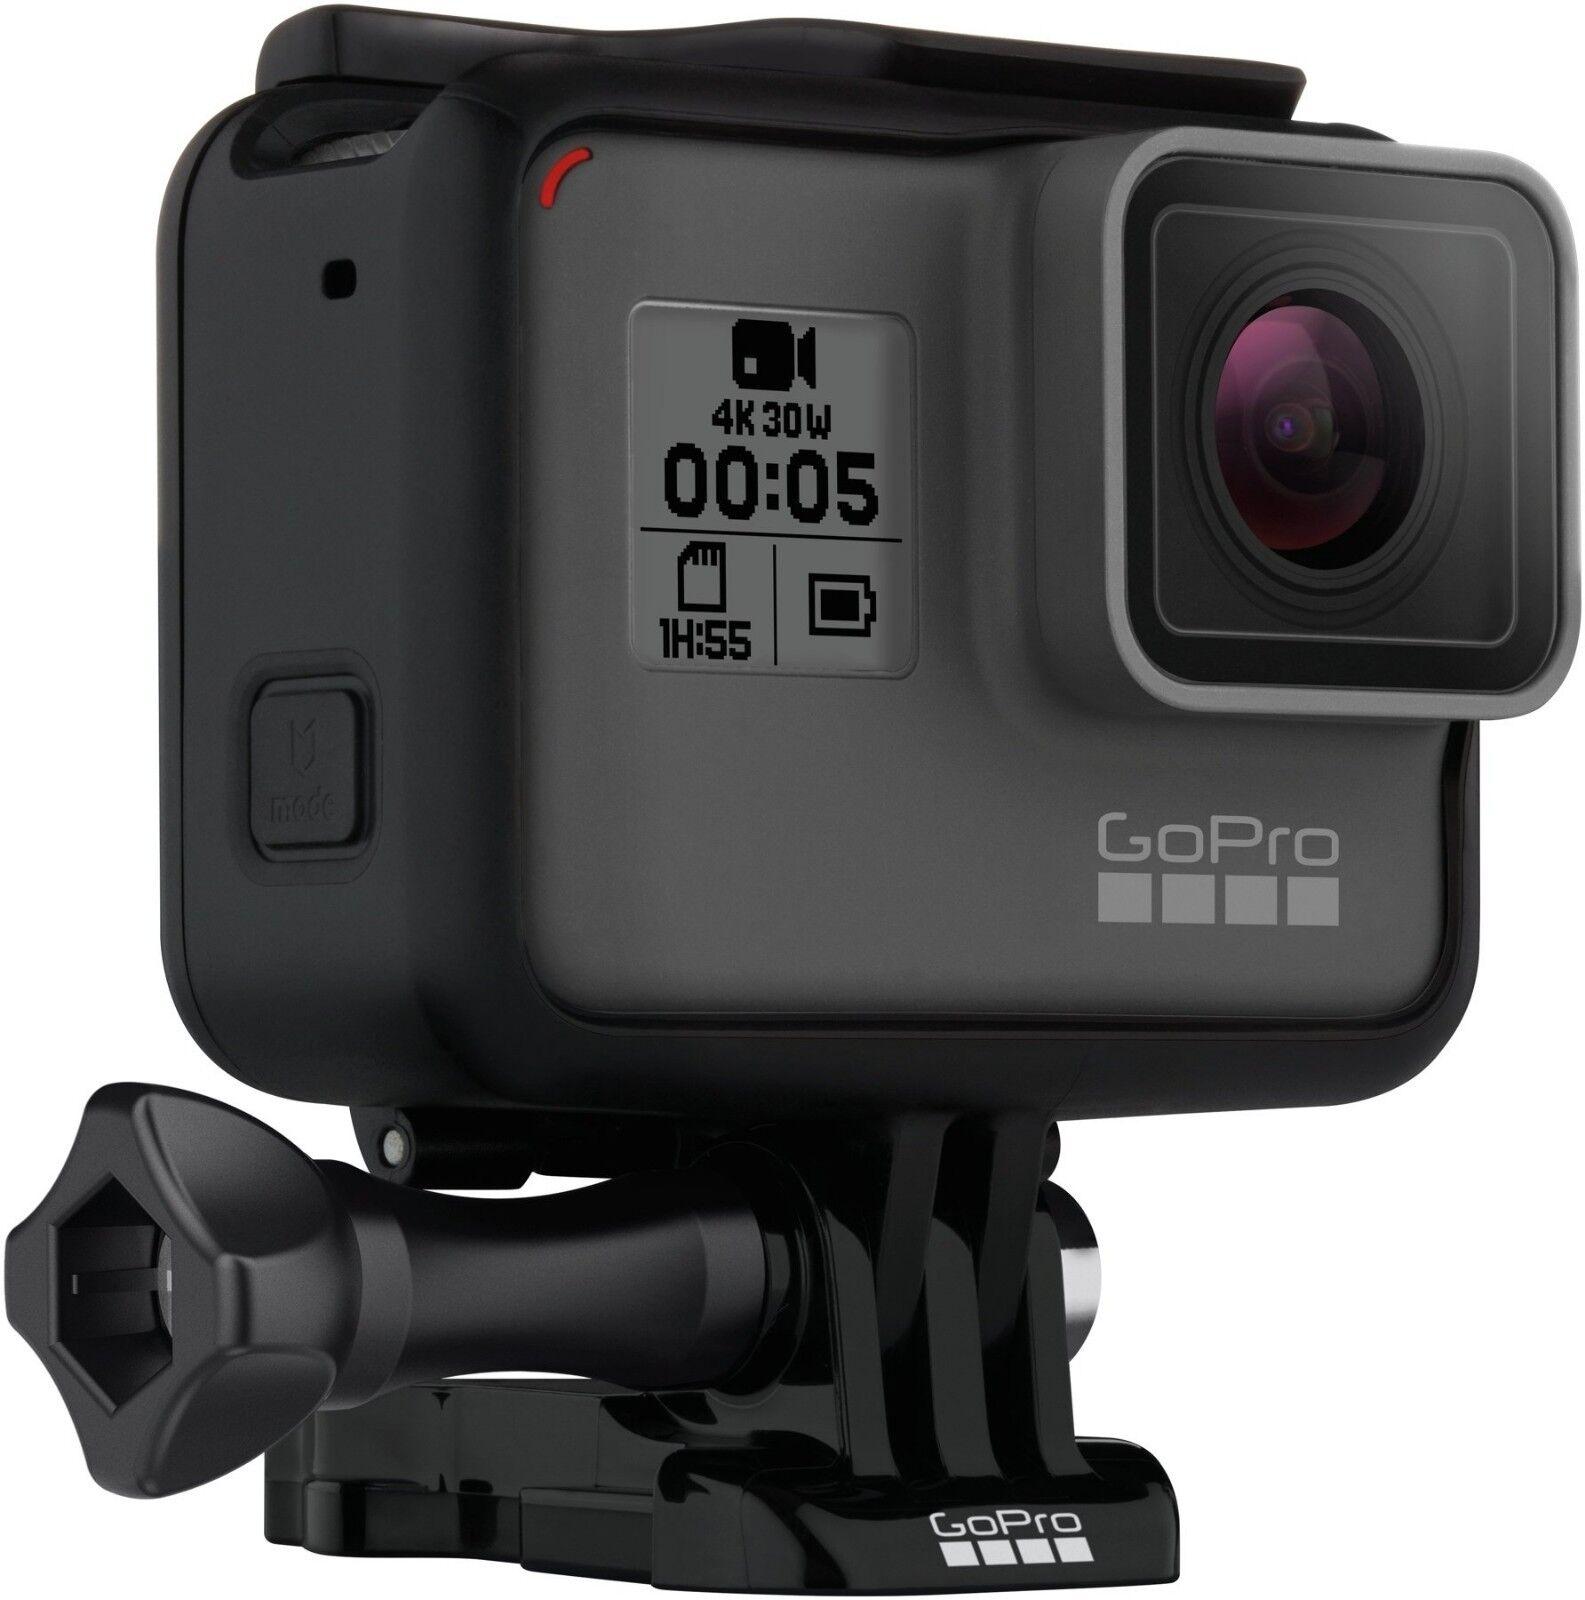 Купить GoPro Hero 5 - GoPro HERO5 Black Waterproof 4K Action Camera